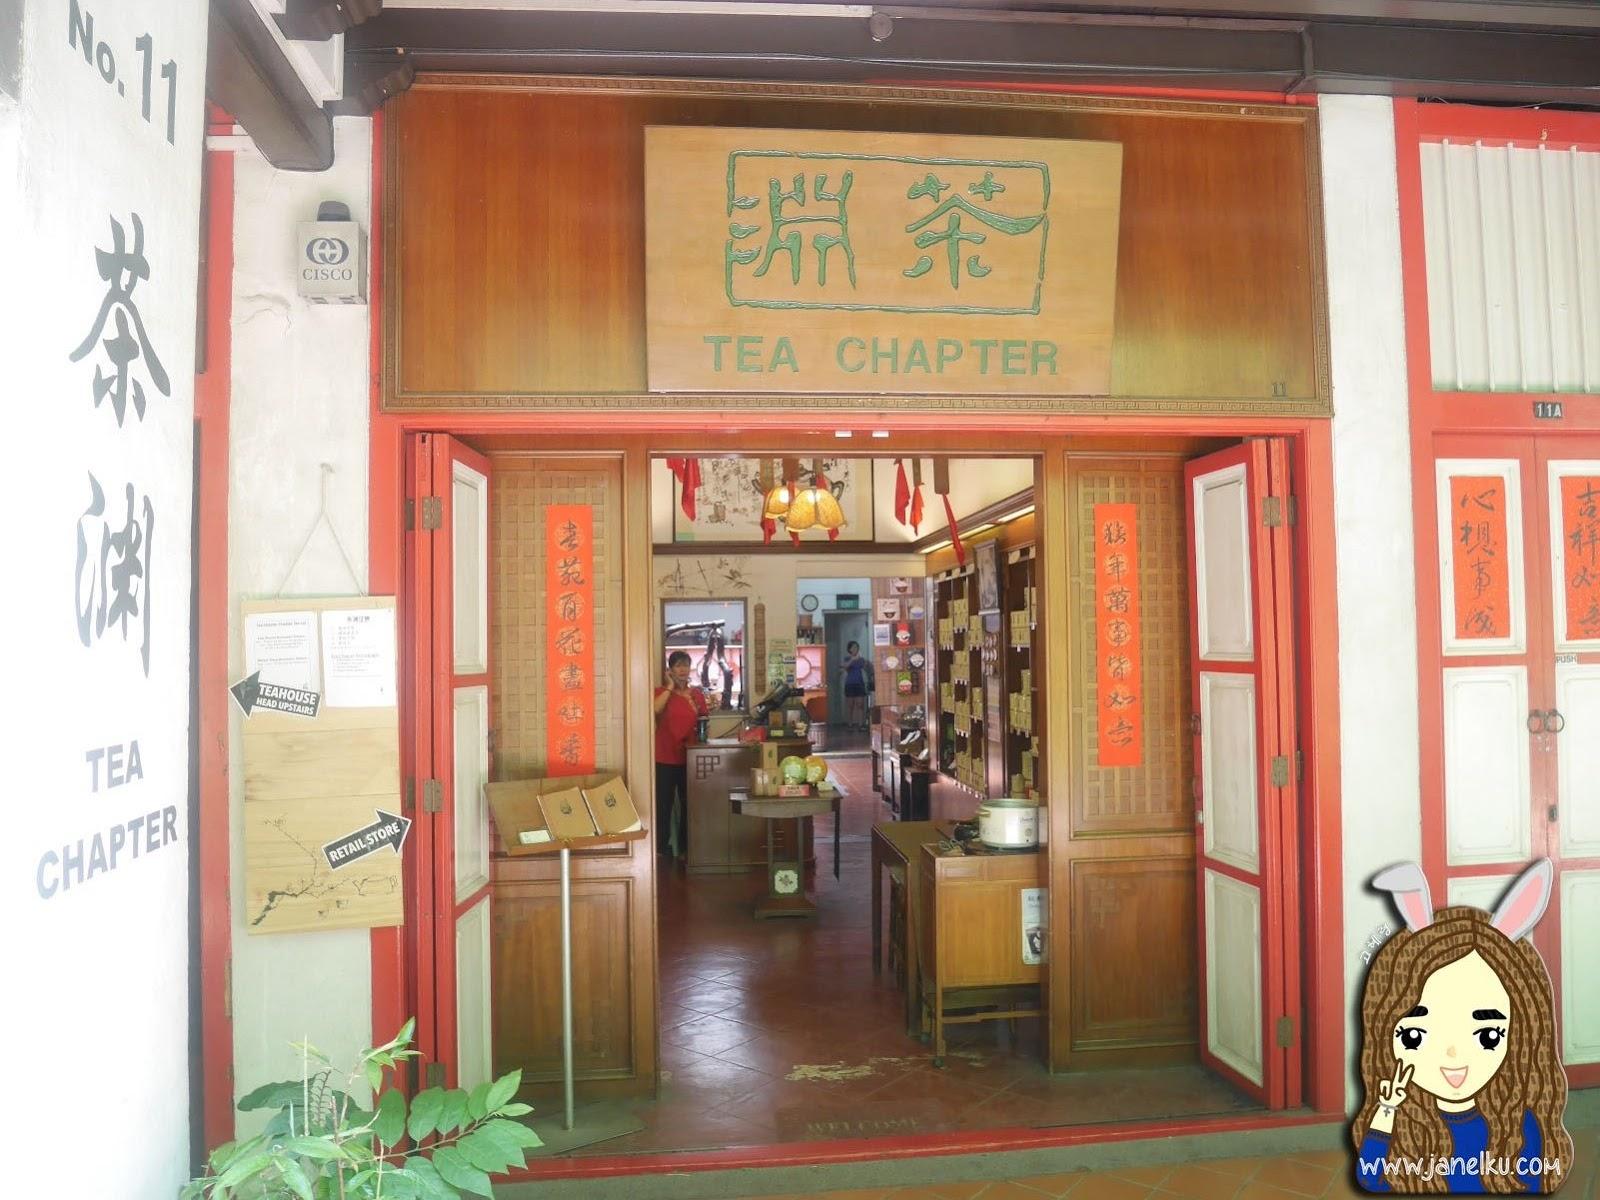 Tea Chapter 茶渊: Chinese Tea Experience